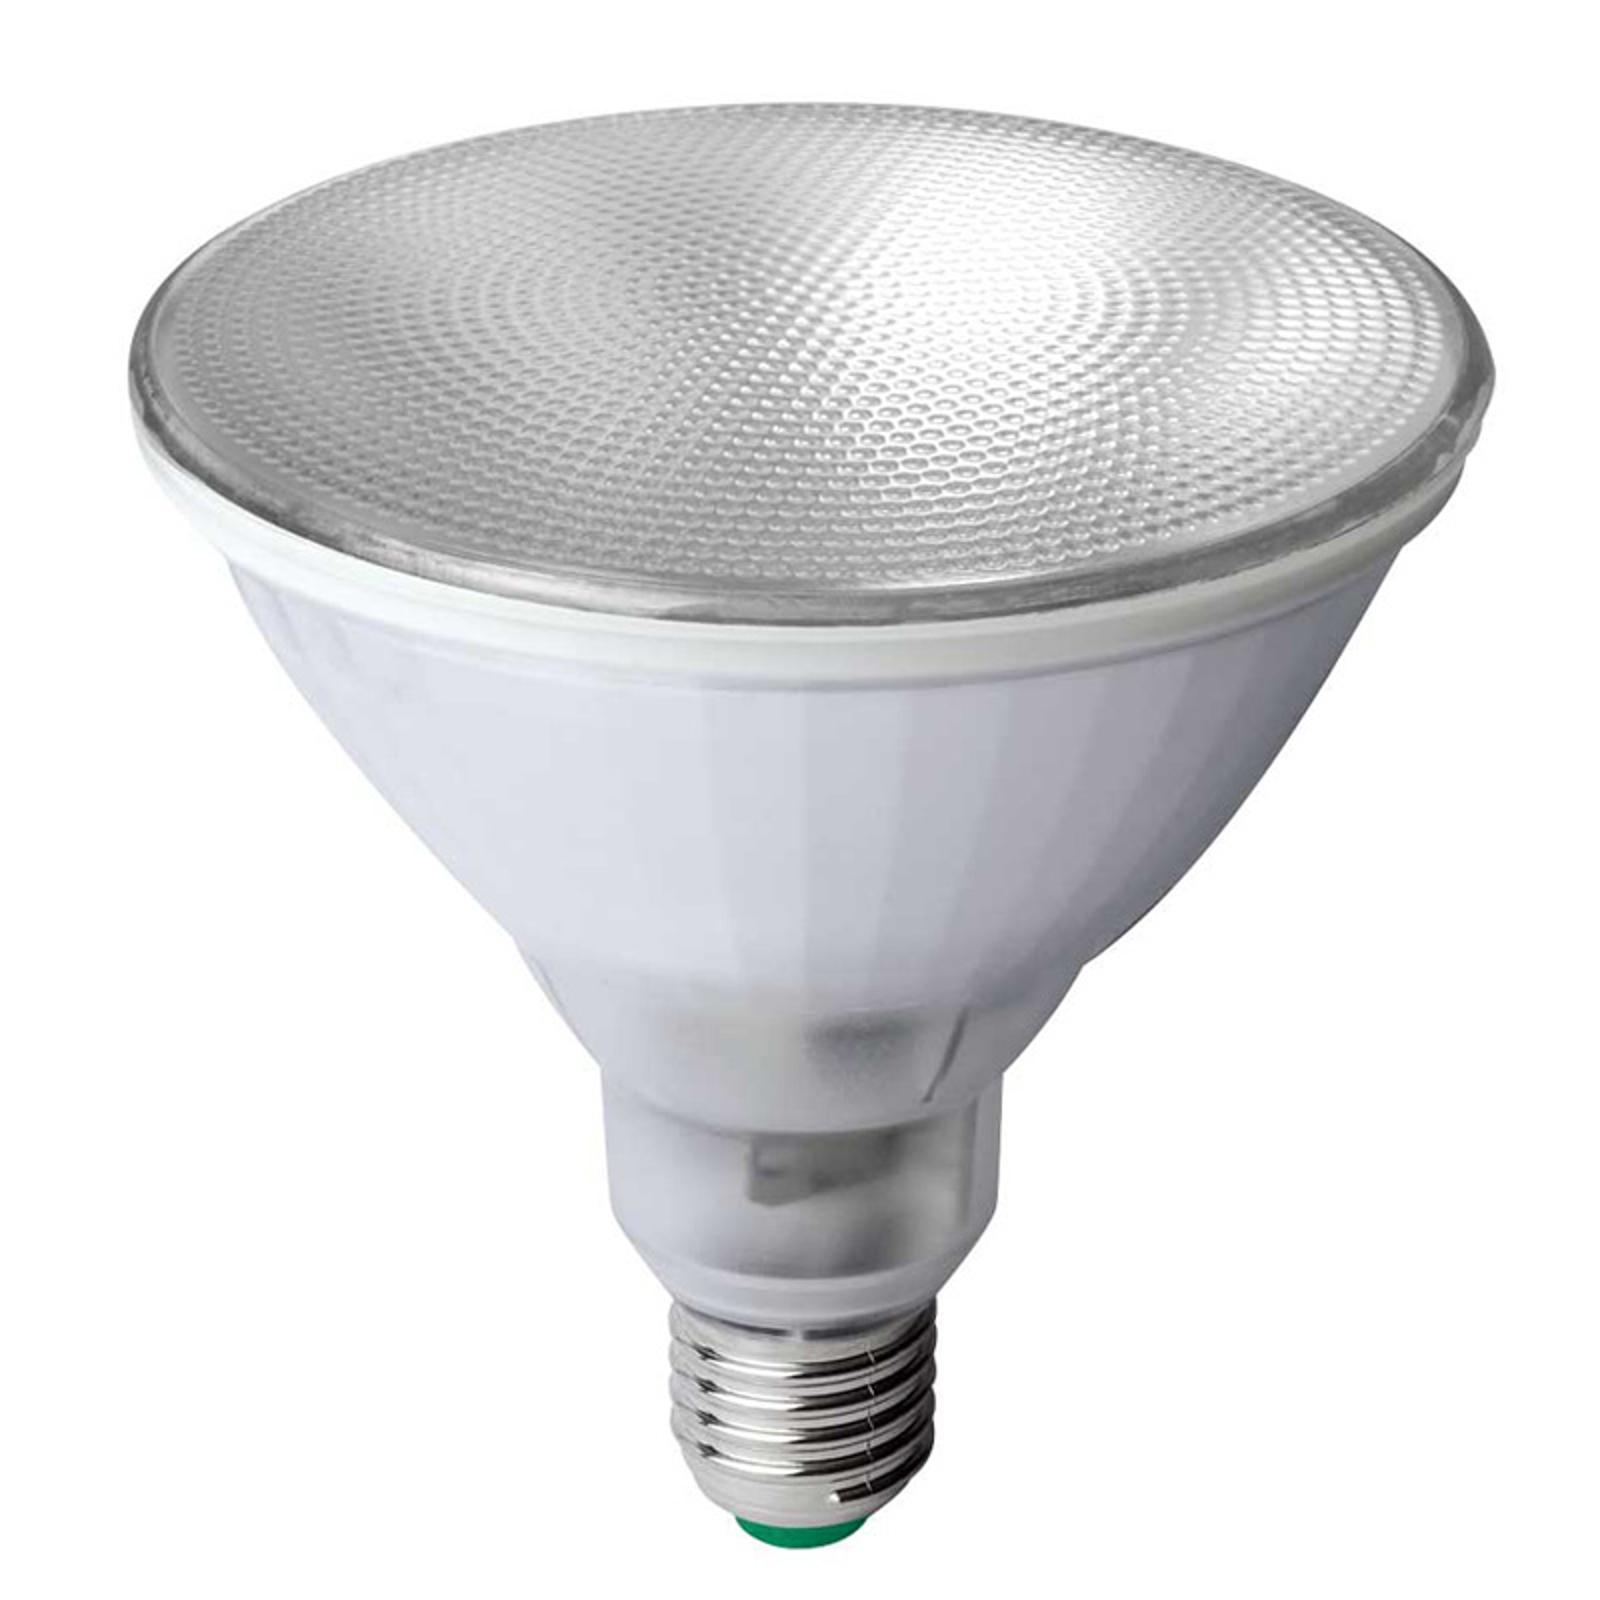 E27 15,5W 828 LED reflektorpære PAR38 35° MEGAMAN